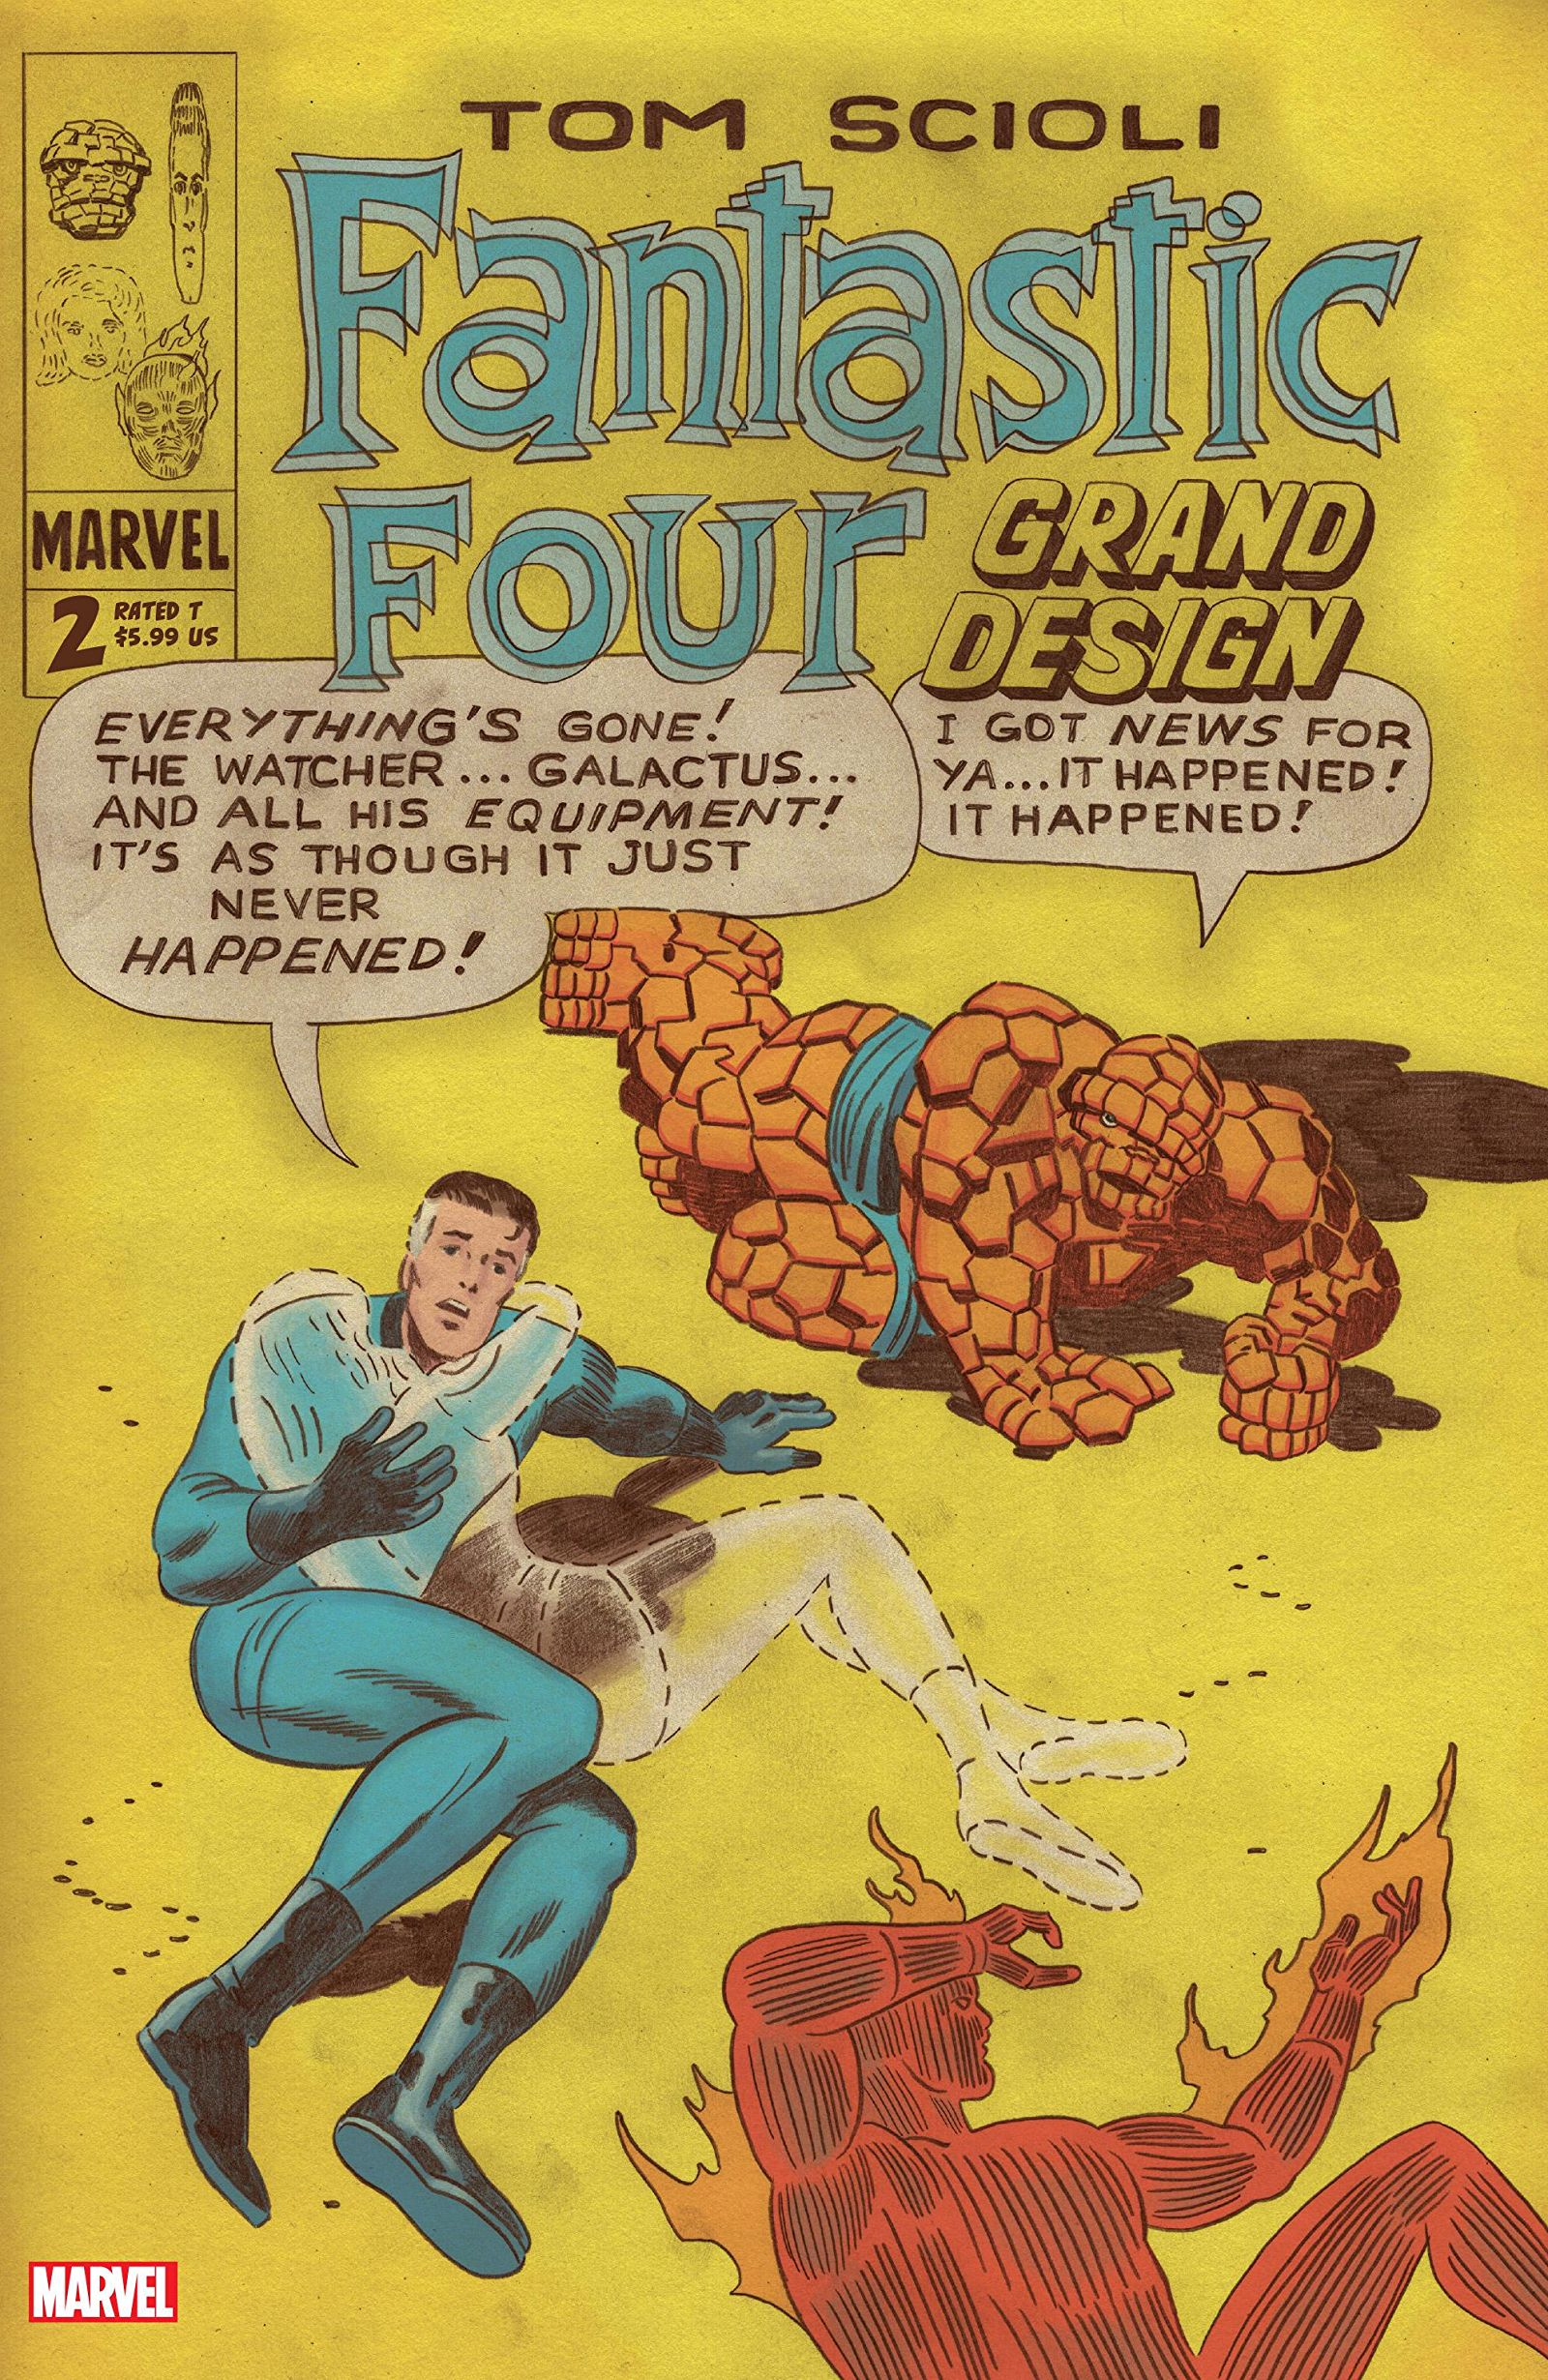 Fantastic Four: Grand Design Vol 1 2